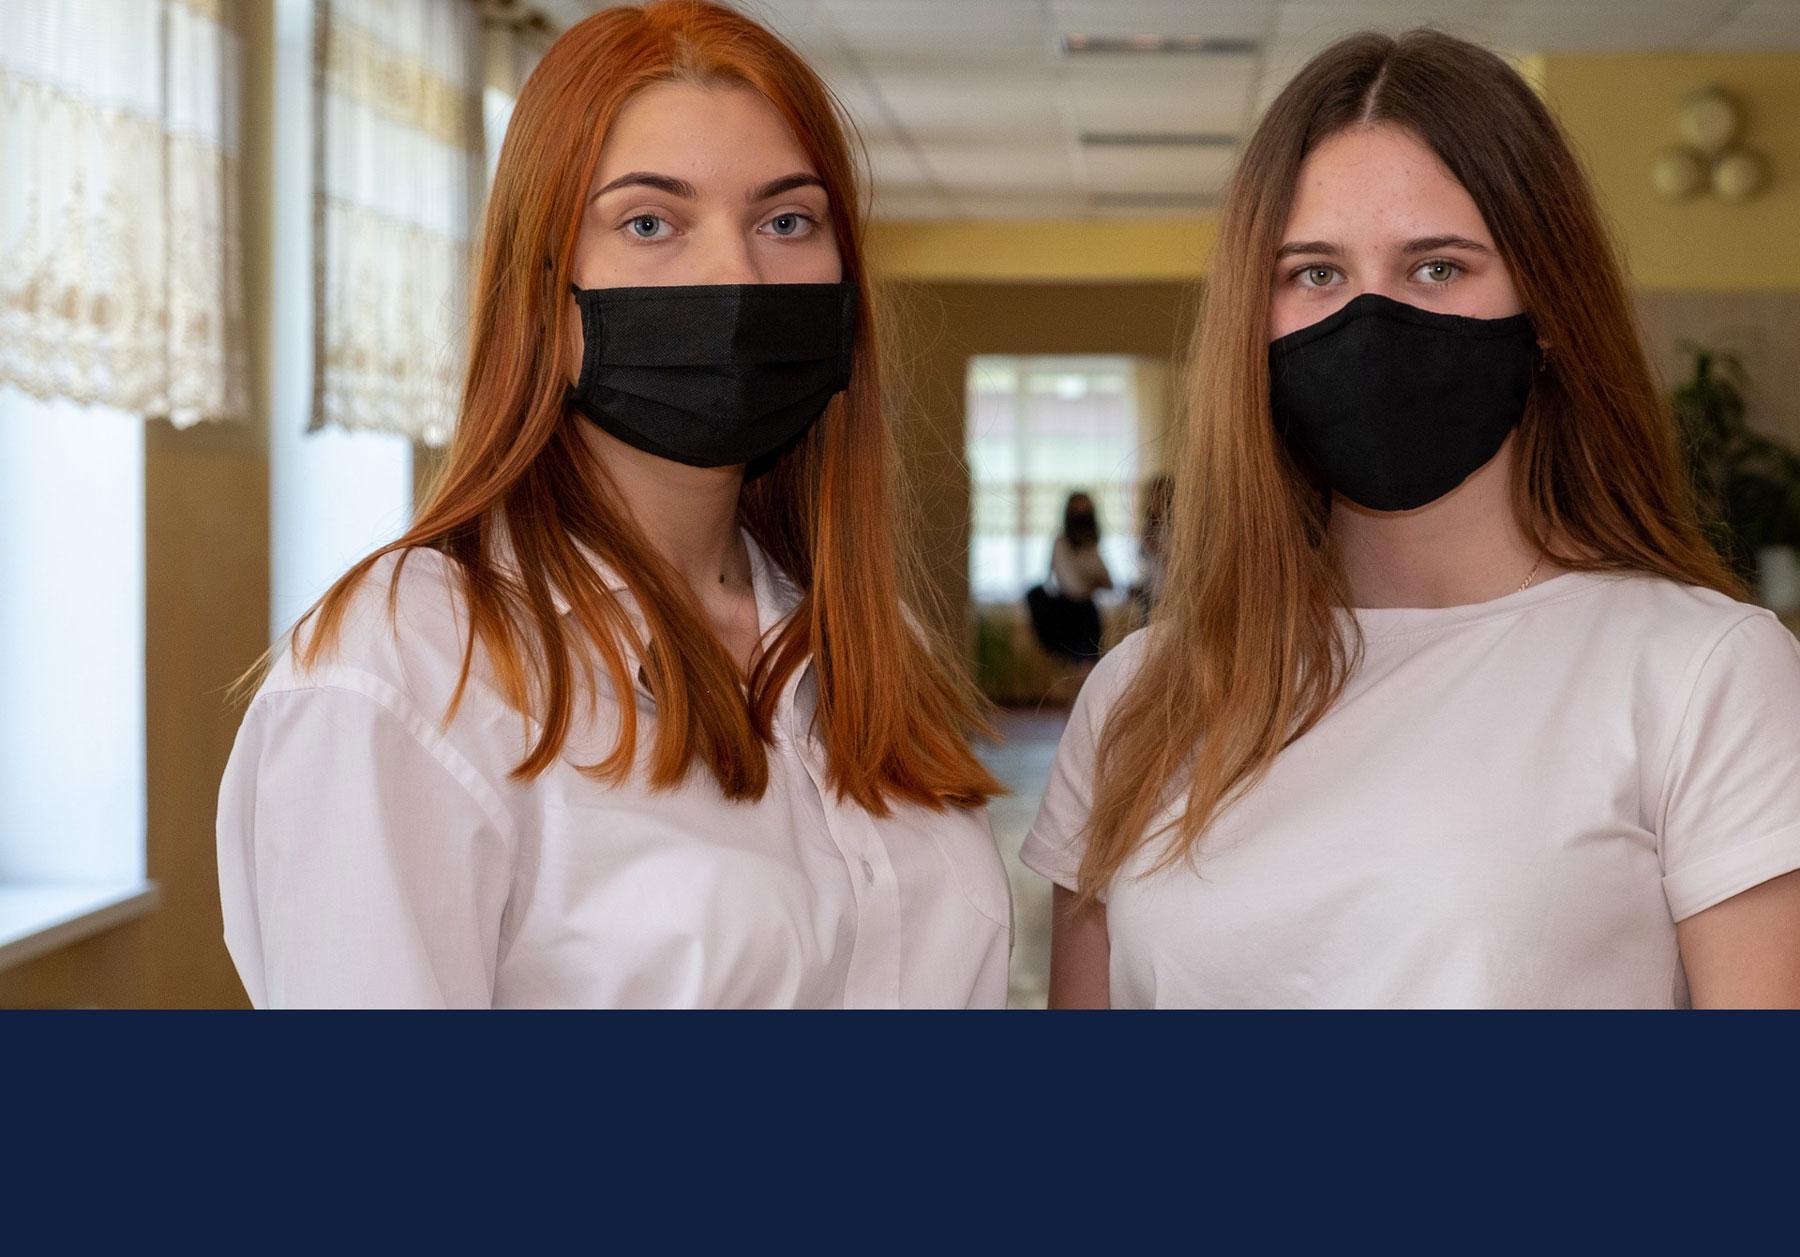 teens wearing masks. Image by Dmitriy Gutarev via Pixabay